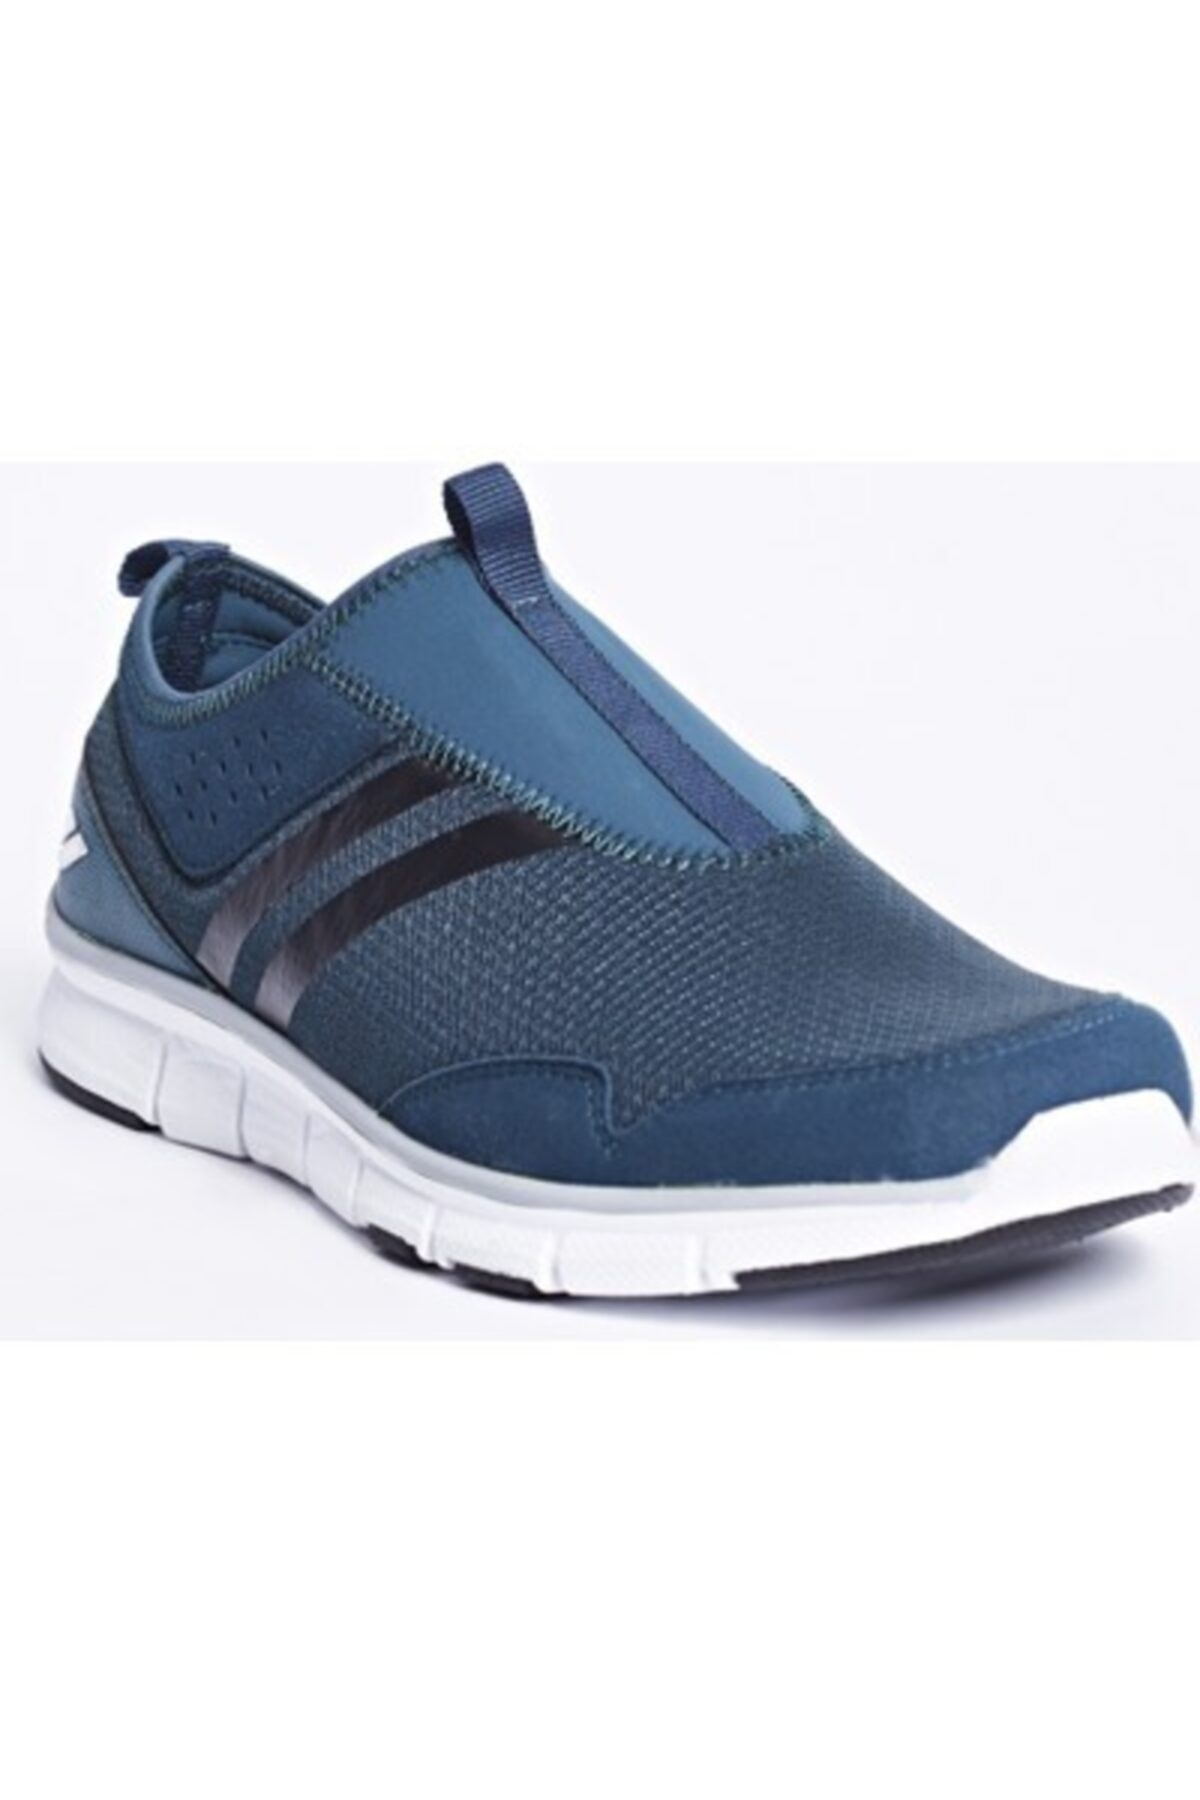 Lescon Unısex Sneaker Aqua Ayakkabı L-4591 1